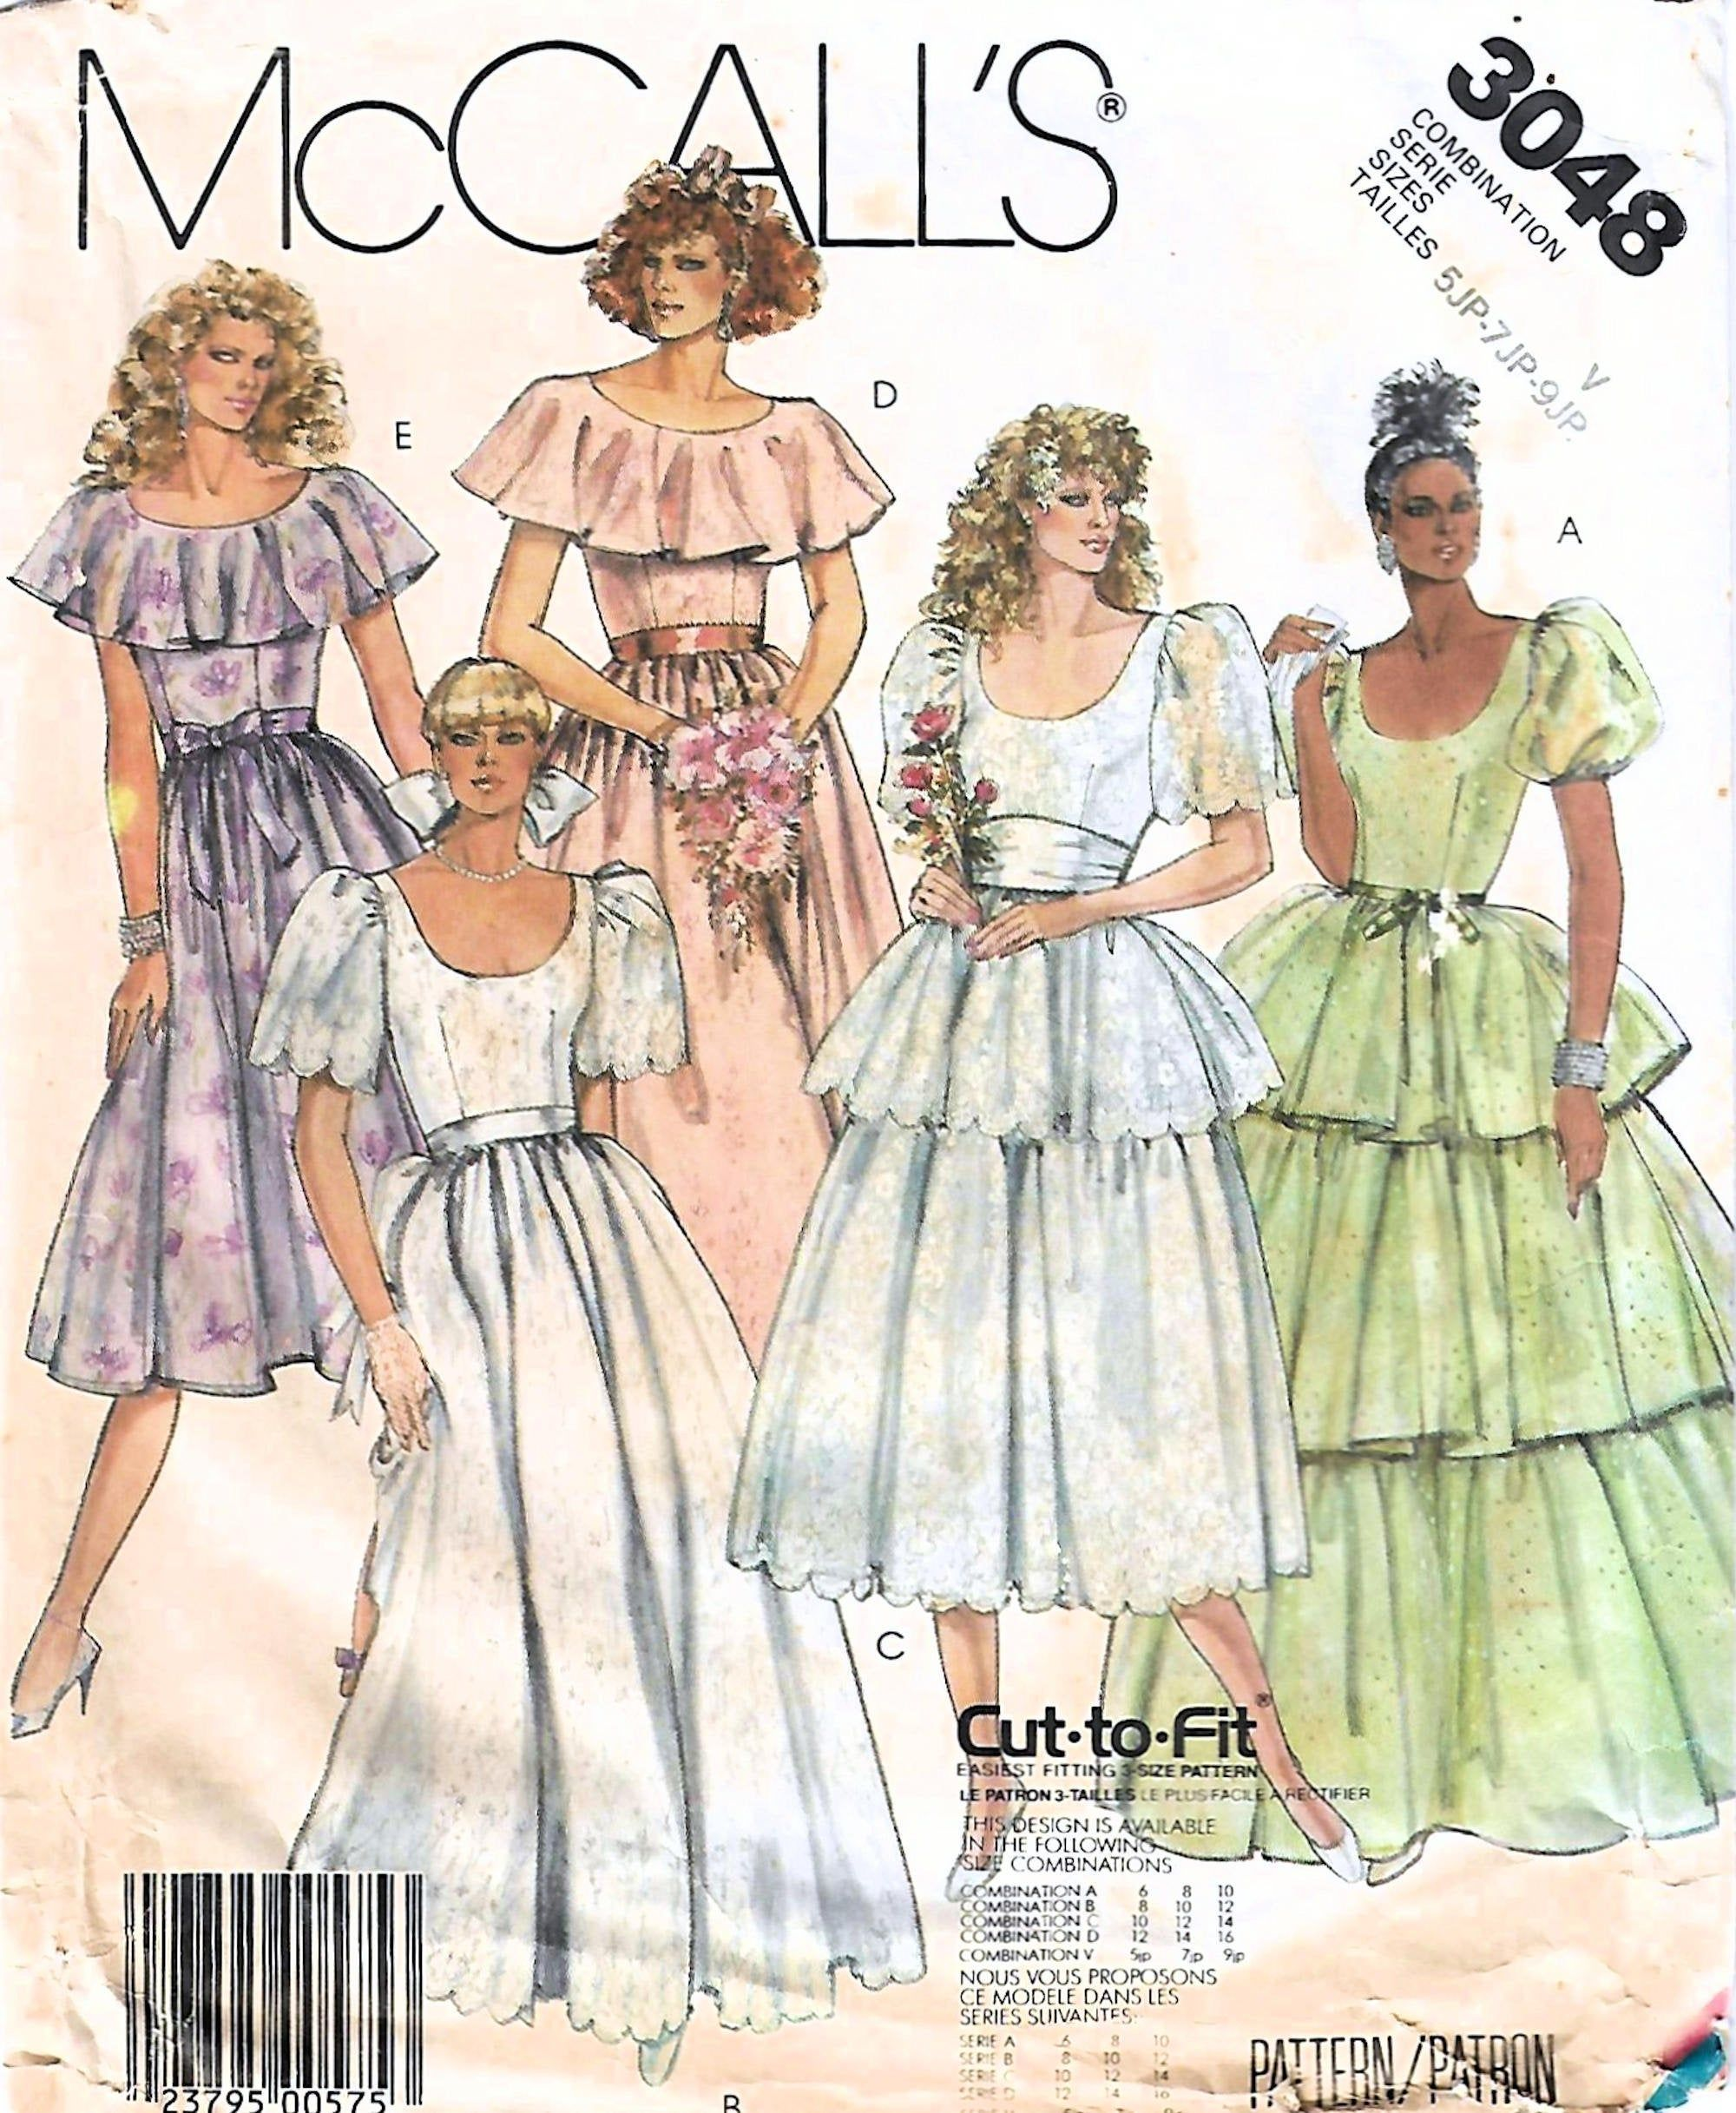 1980s Mccall S 3048 Vintage Sewing Pattern Junior Petite Etsy Petite Formal Dresses Skirt Patterns Sewing 1980 Dress Patterns [ 2434 x 2000 Pixel ]